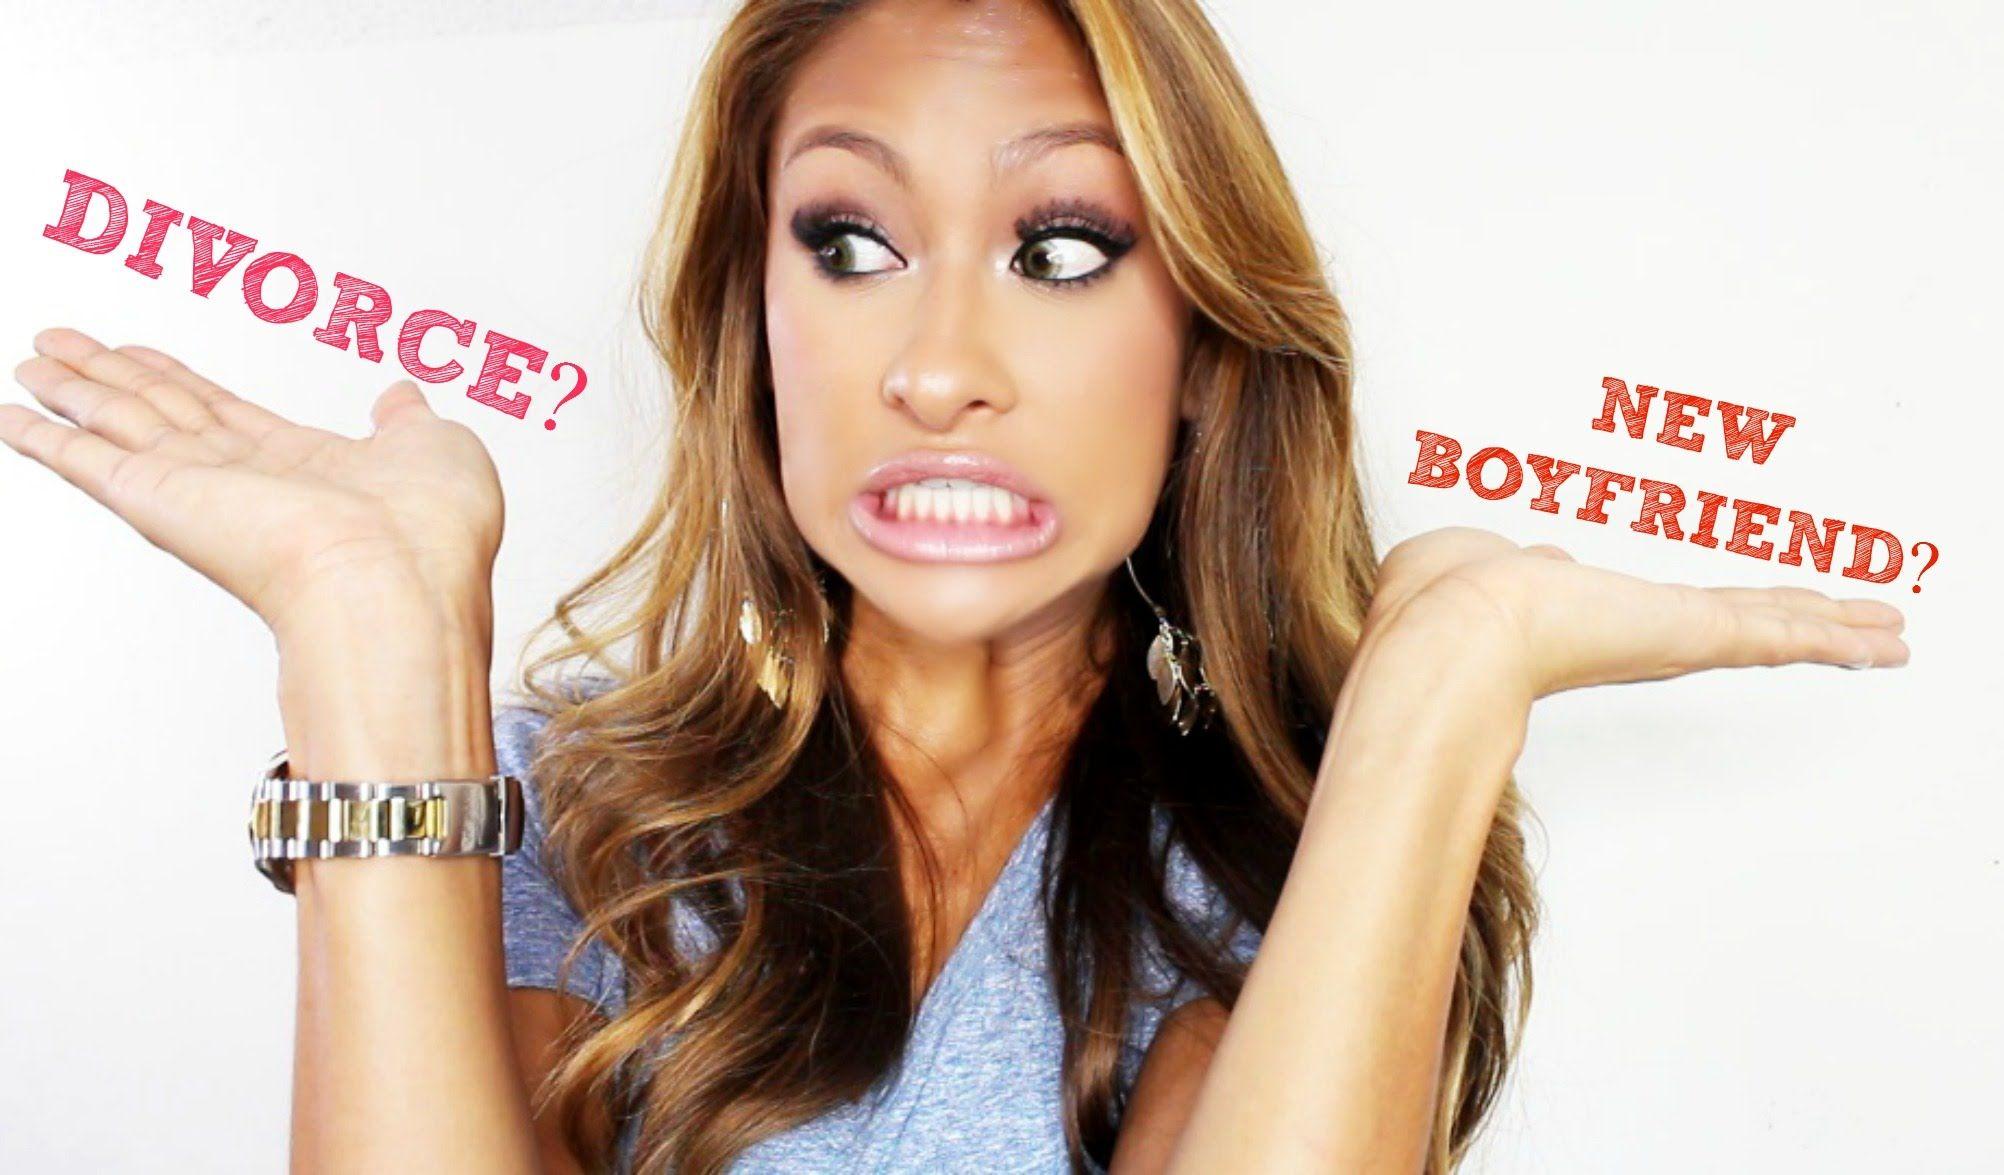 DIVORCE? NEW Boyfriend? Moving? Lets Talk!